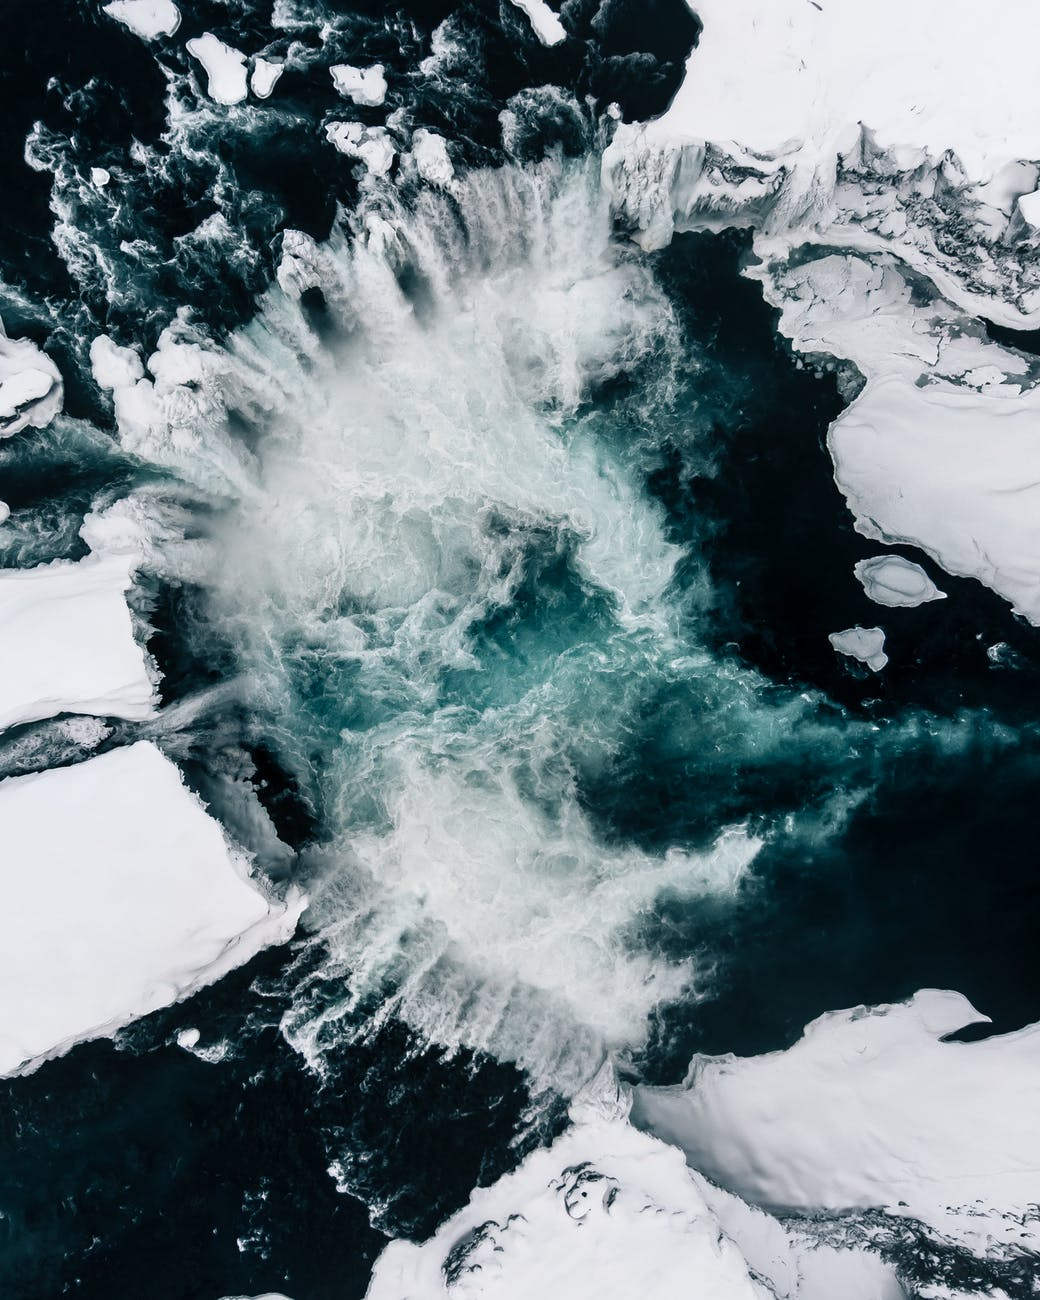 aerial photo of waterfalls